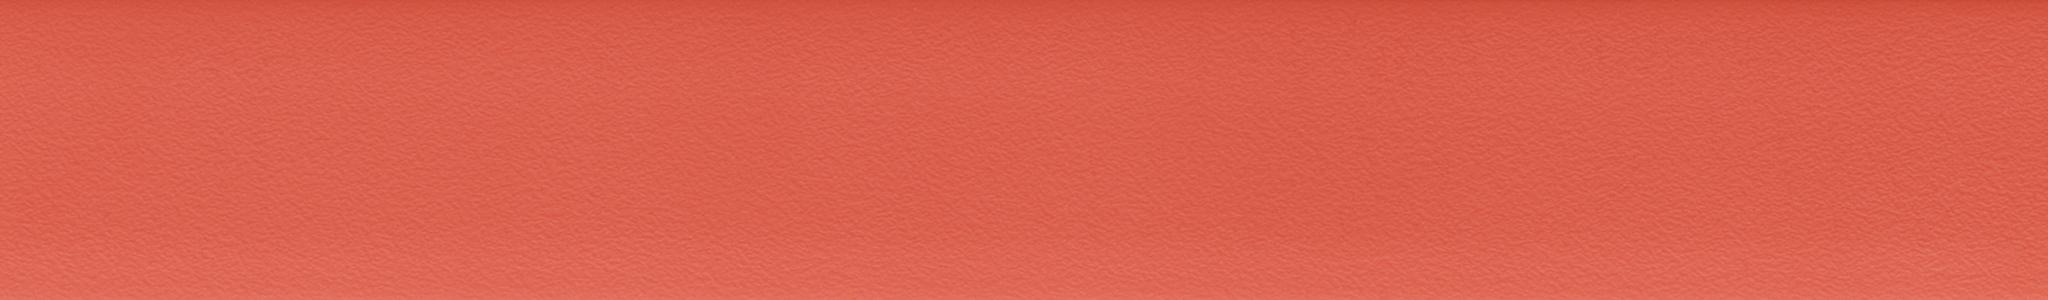 HU 13390 Chant ABS Rouge Perle XG